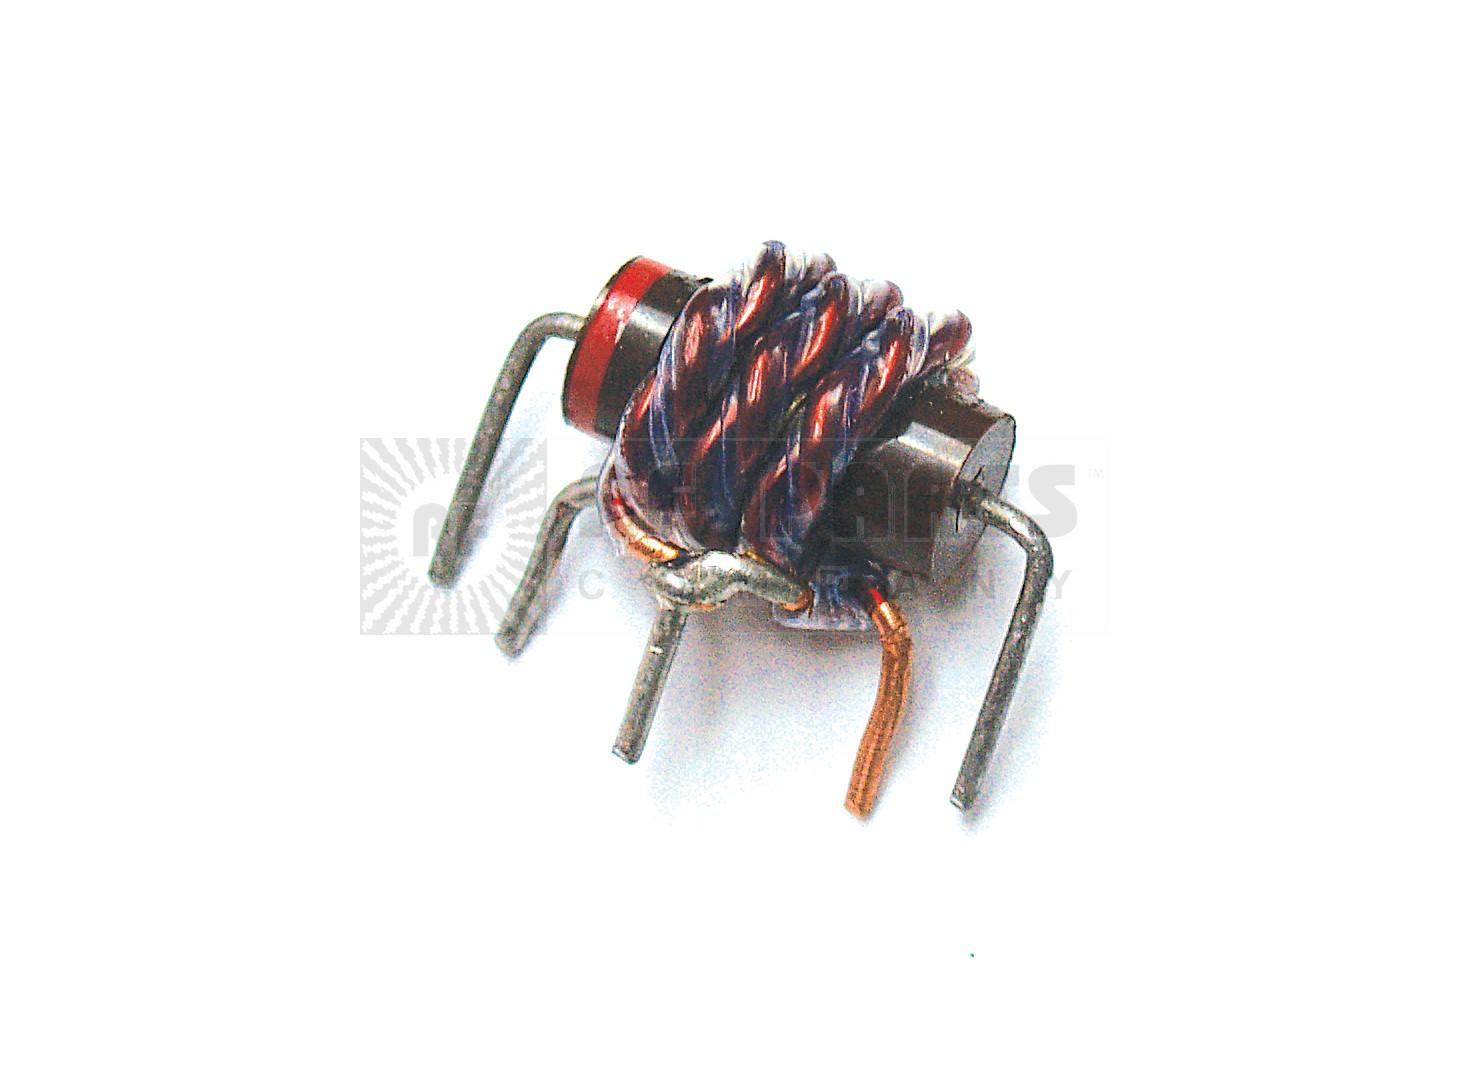 19A129563G4 Choke coil, ge